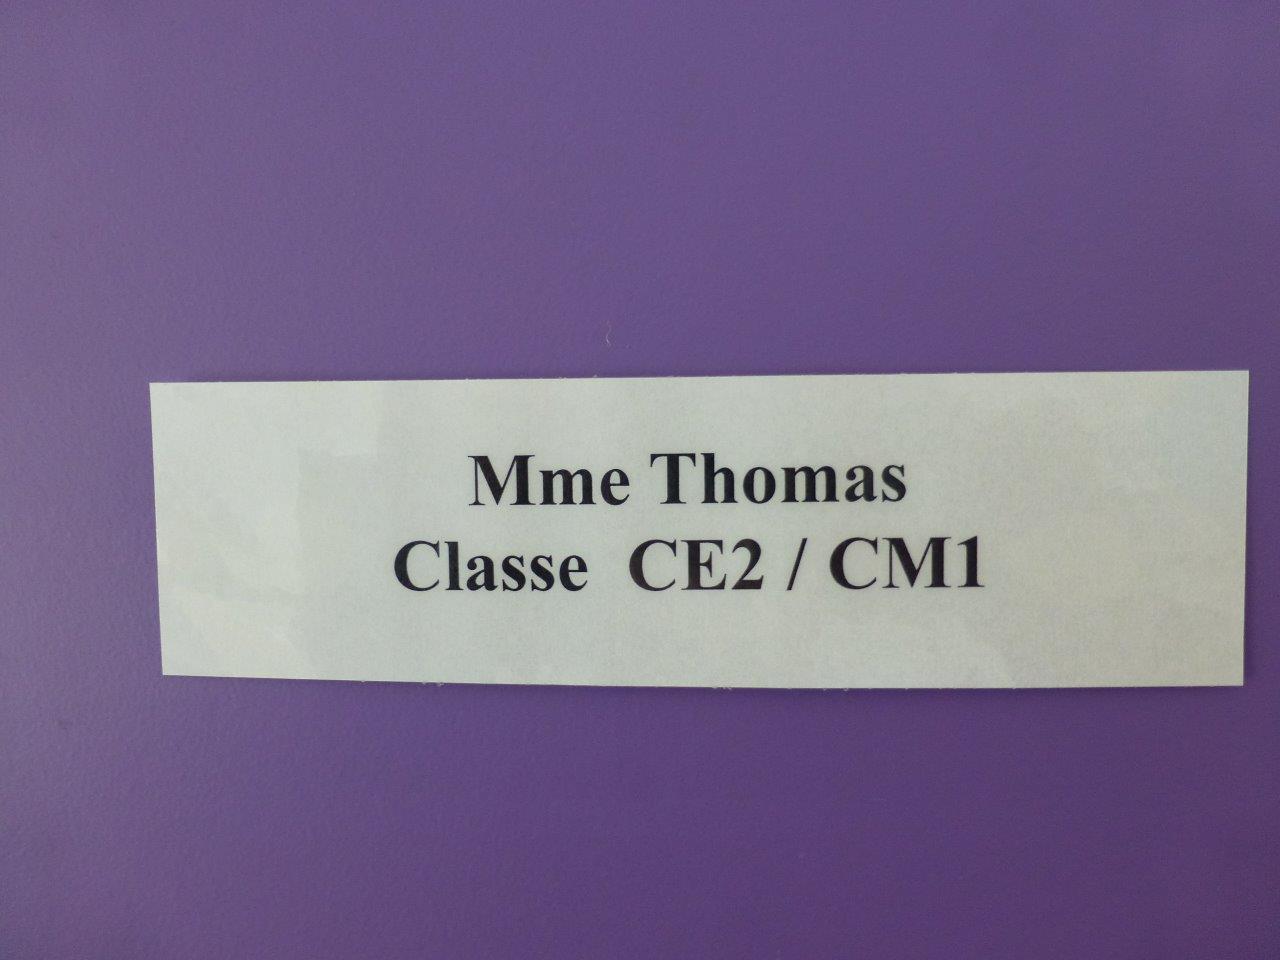 Classe Mme Thomas (1)